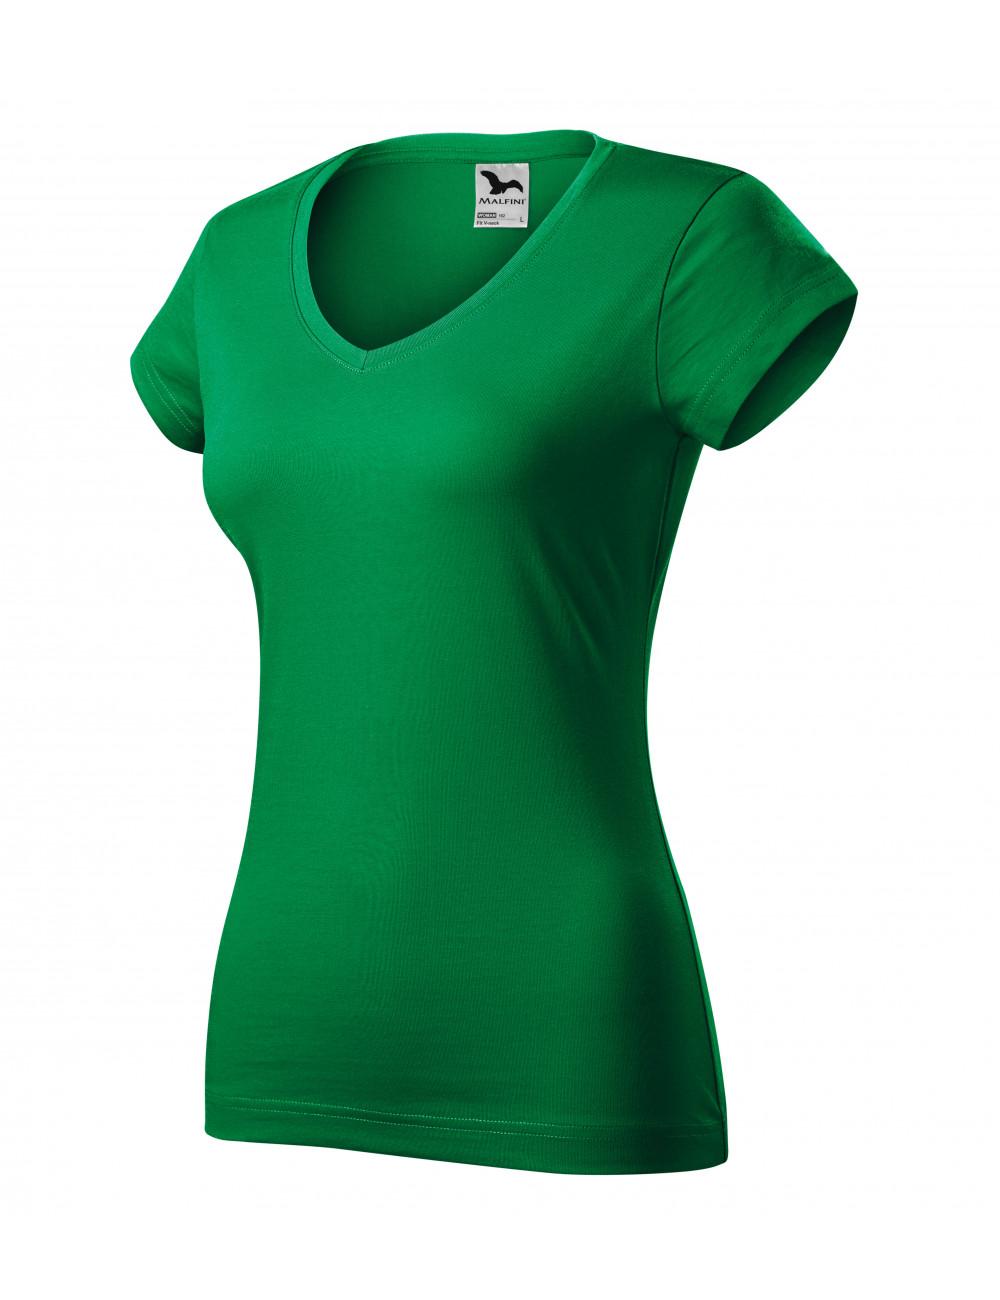 Adler MALFINI Koszulka damska Fit V-neck 162 zieleń trawy